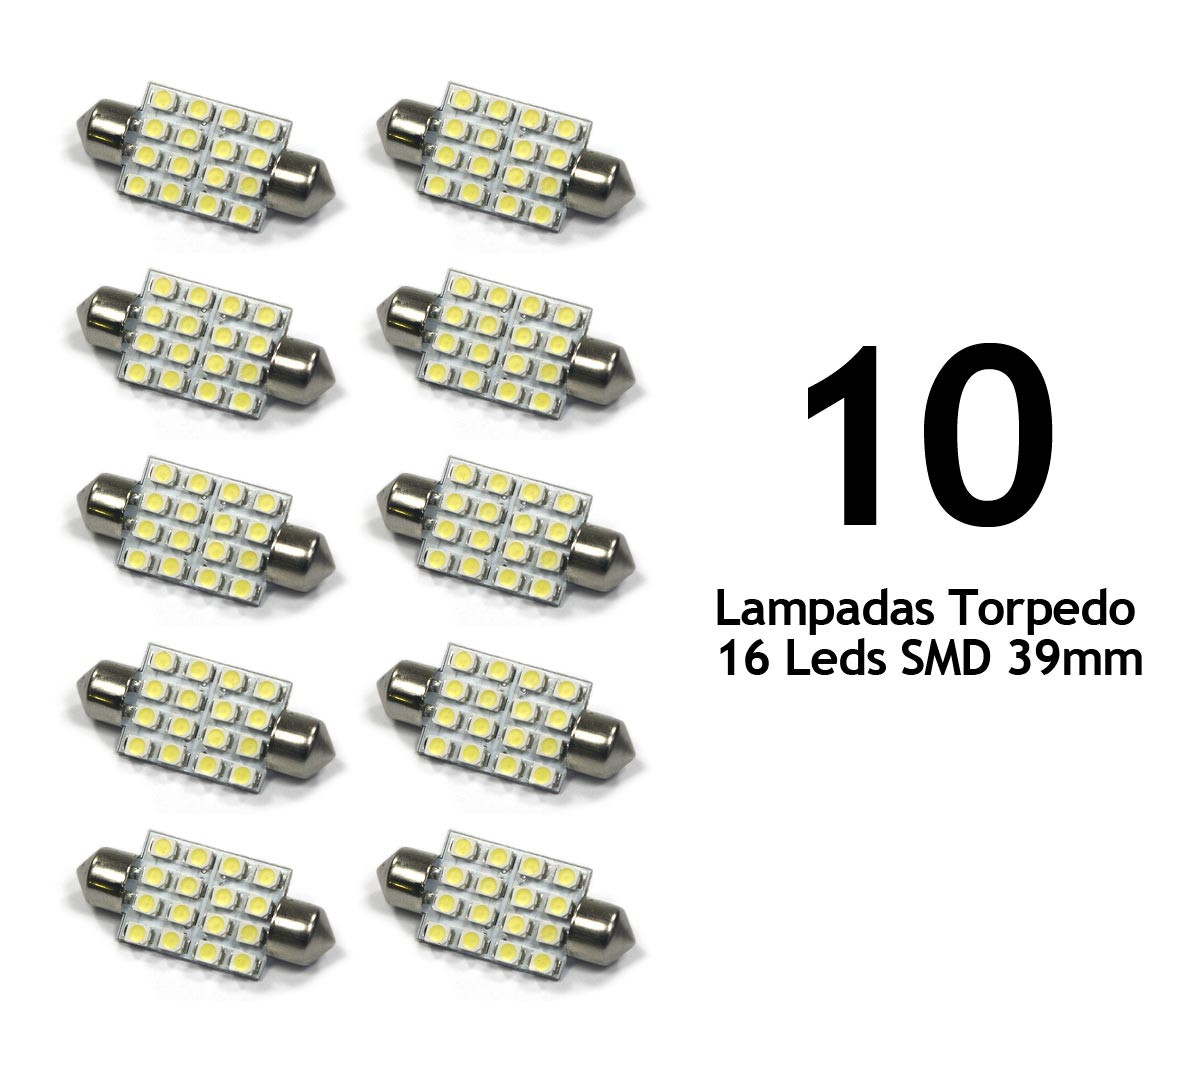 Lote 10 Lampadas Torpedo 16 Leds SMD 39mm Super Branca - Luz Teto Placa Porta Mala / Luvas